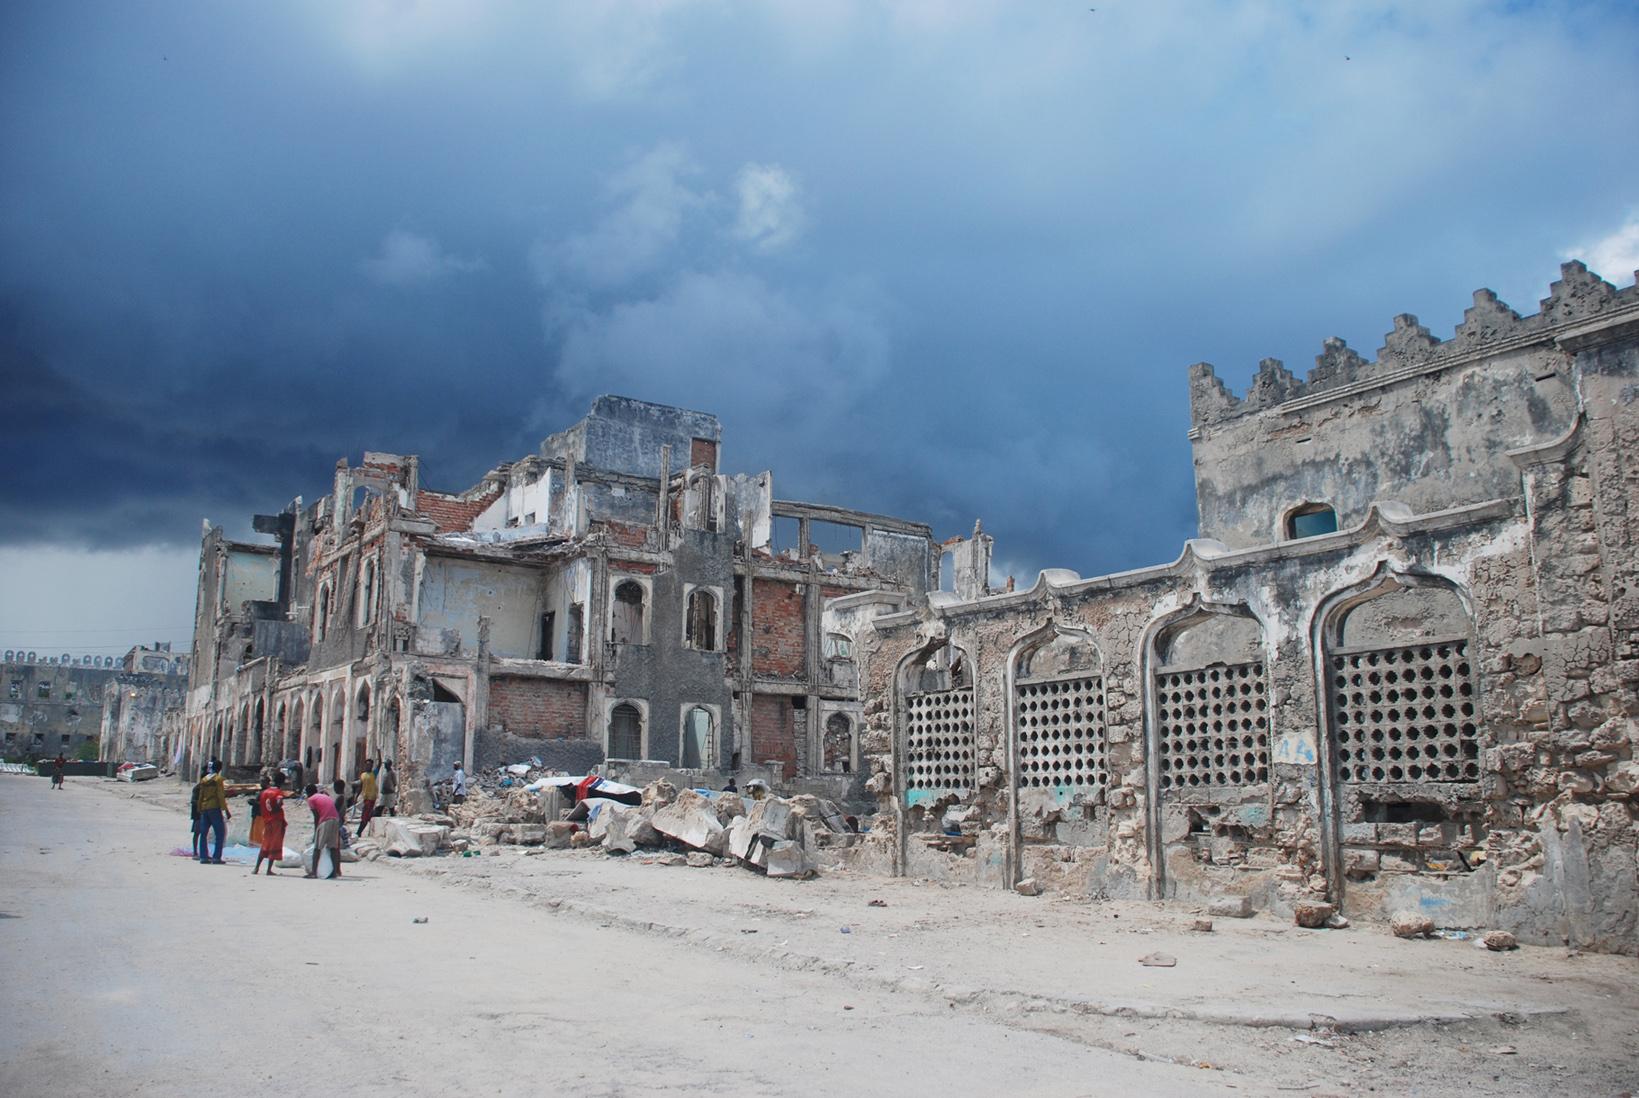 Zentrum von Mogadischu |  Bild (Ausschnitt): © Sadikgulec - Dreamstime.com